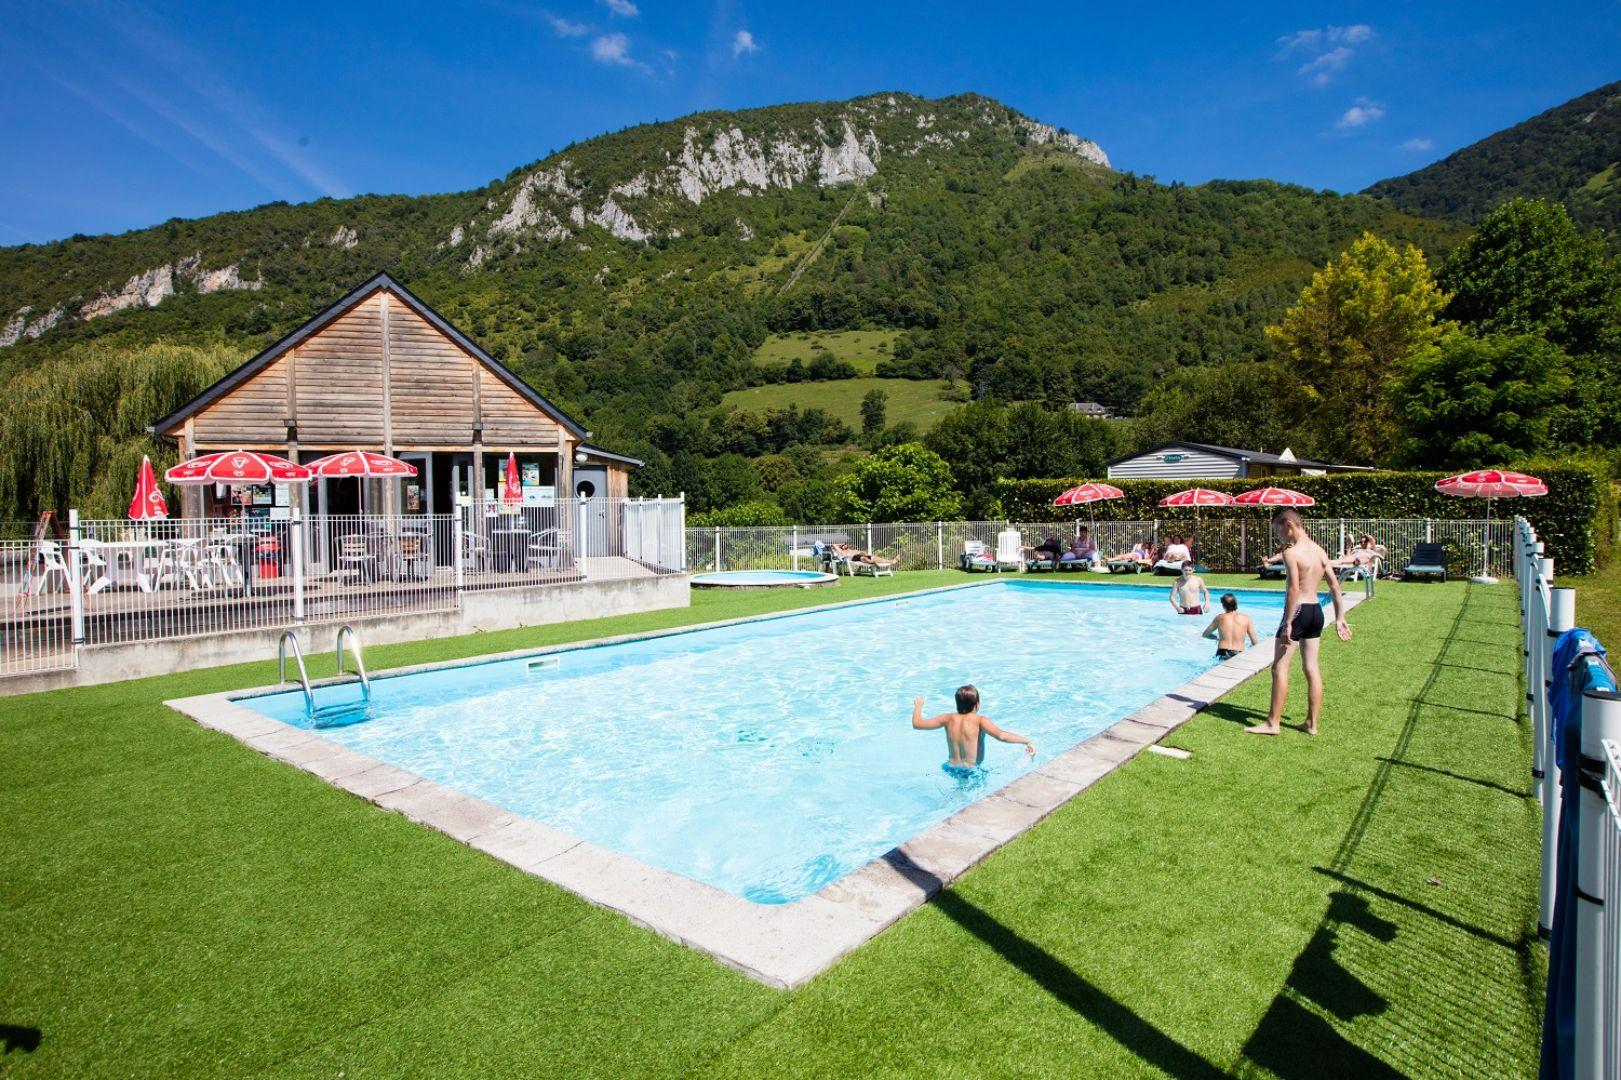 Camping Avec Piscine Hautes Pyrénées : Camping Avec Piscine ... avec Camping Avec Piscine Pyrénées